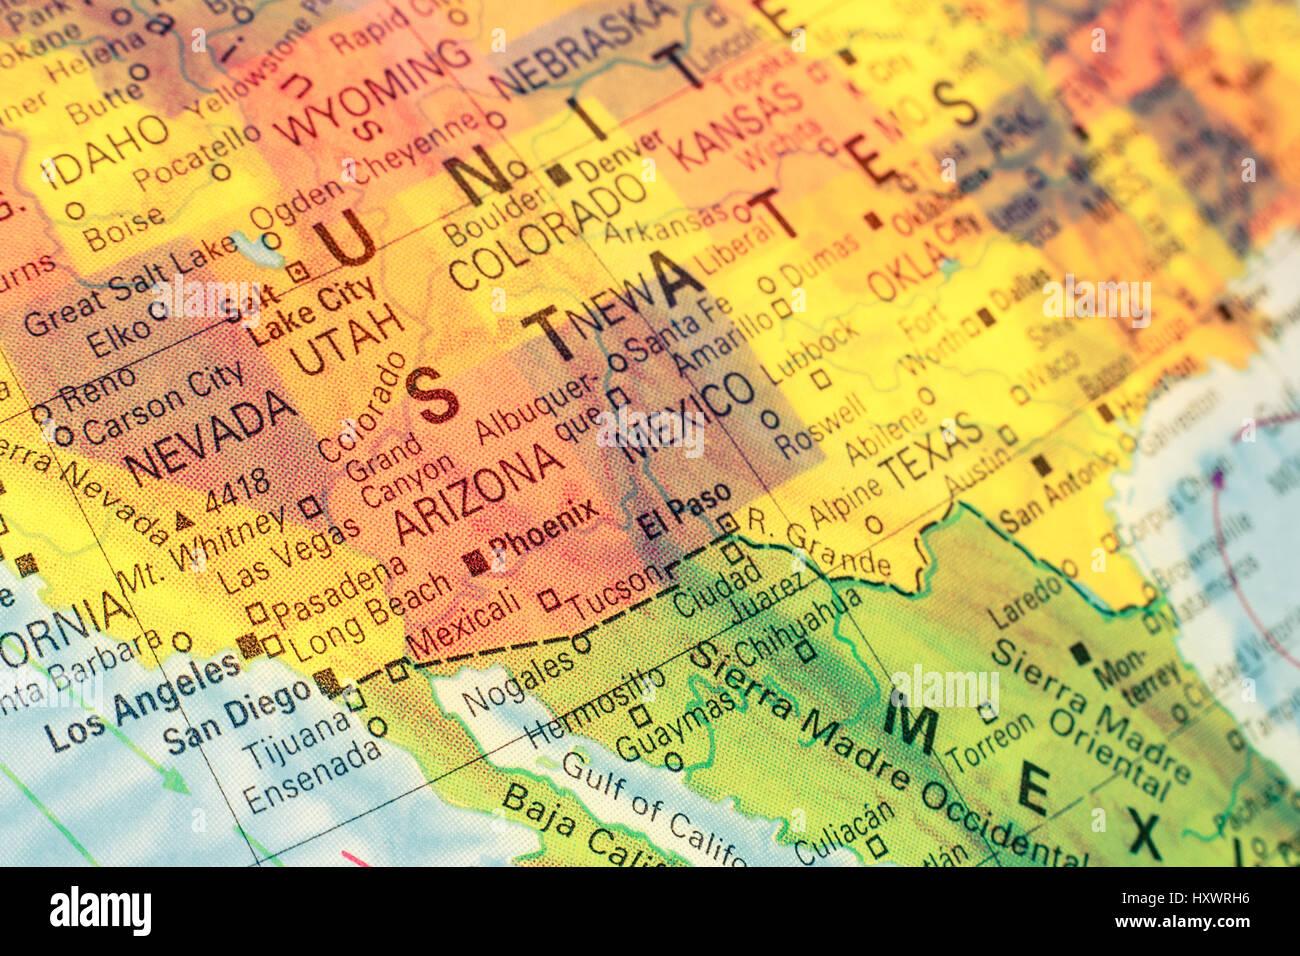 Karte Sud West Usa Nahaufnahme Makro Bild Karte Sudamerika West